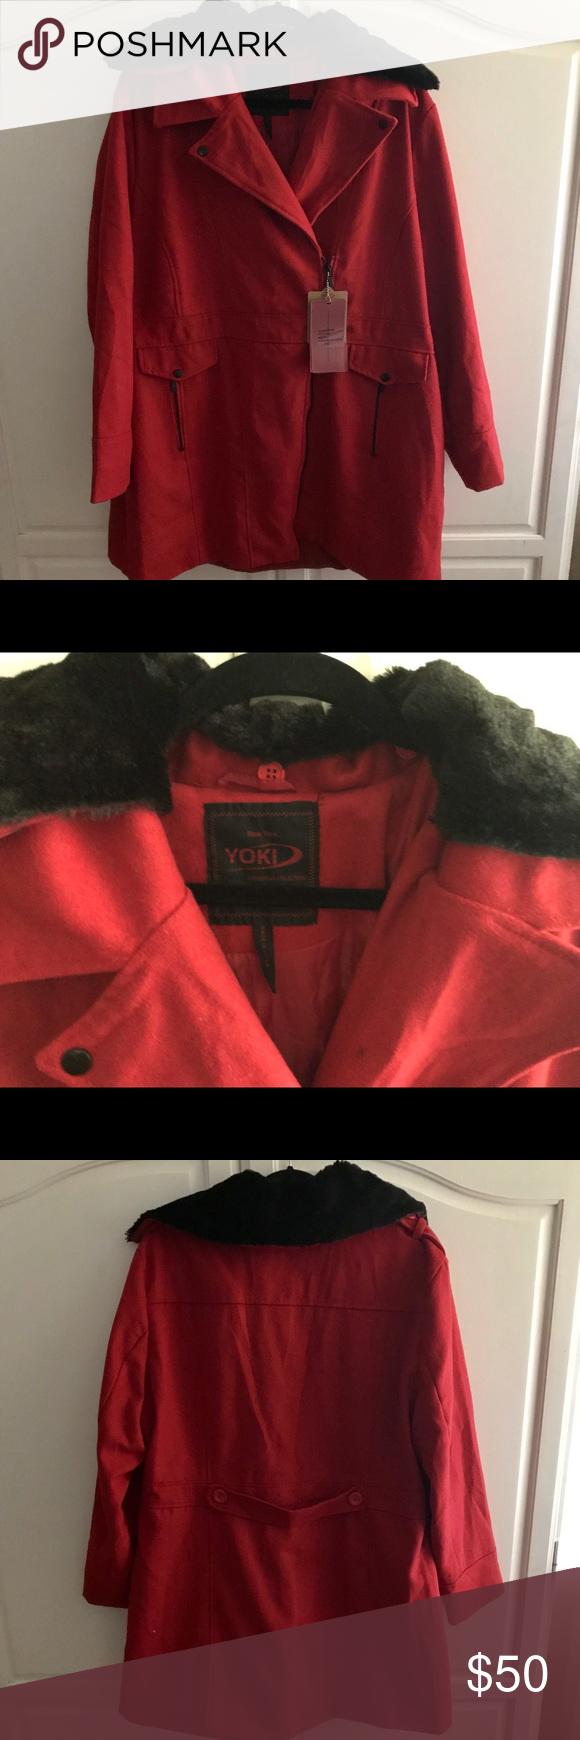 Yoki Outerwear Collection Jacket Yoki Red Jacket Jackets [ 1740 x 580 Pixel ]